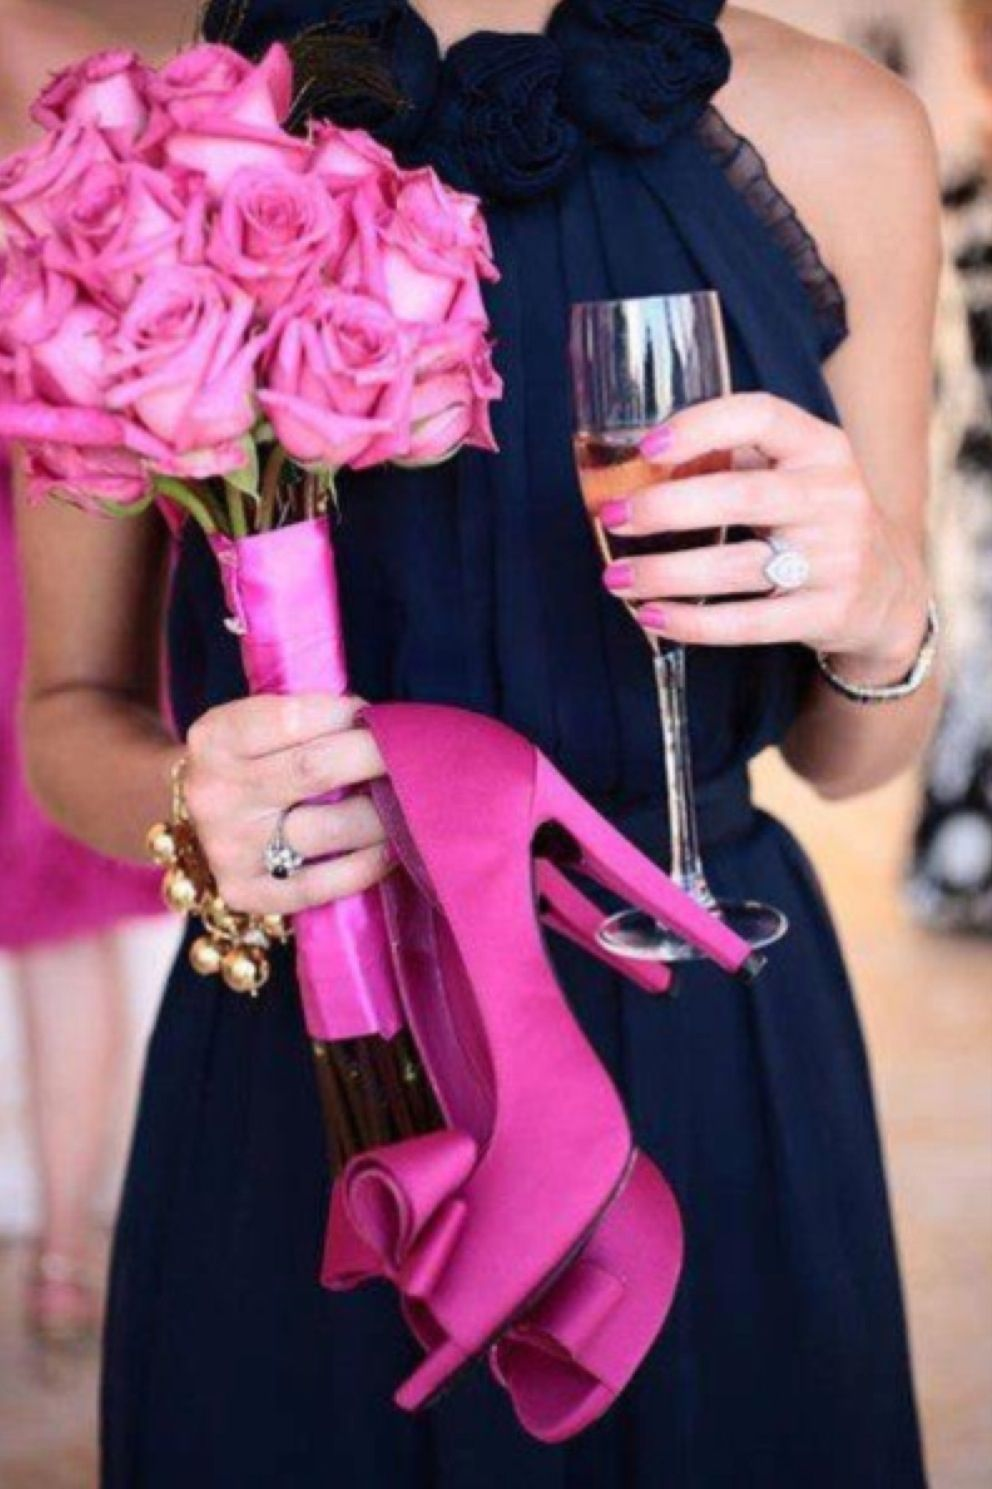 Hot pink color dress  Pin by Christina Austin on Paris Pearls u Pink  Pinterest  Pearls